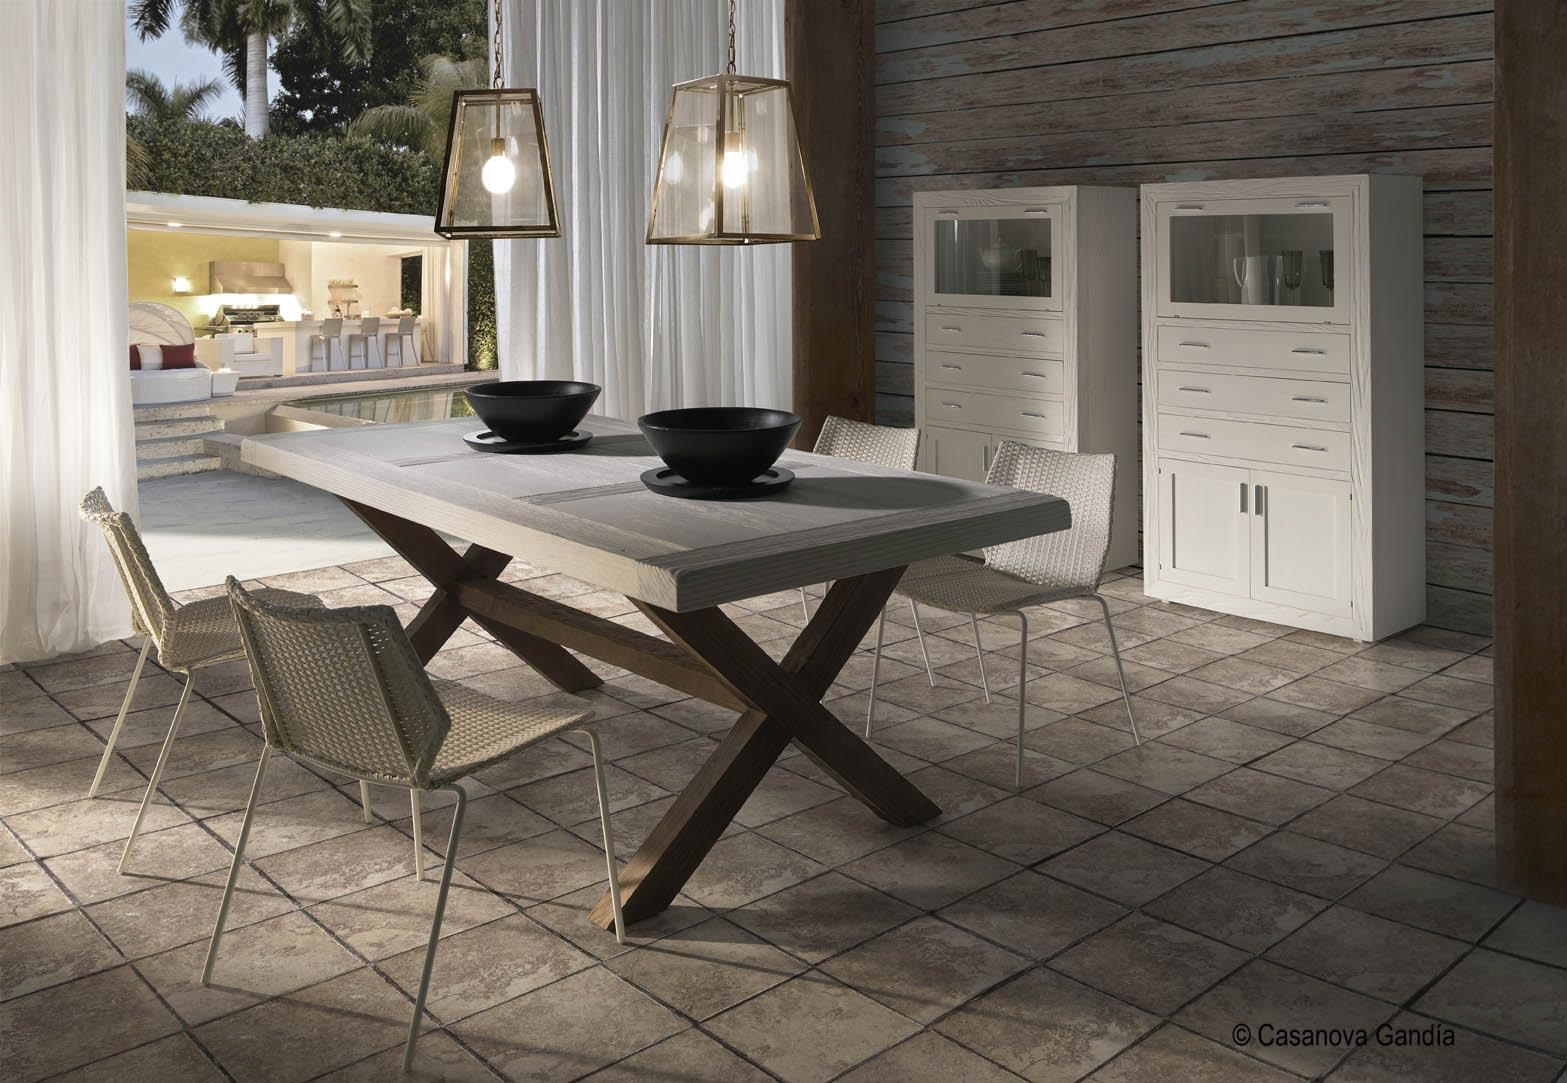 Renovar tu hogar con muebles casanova gandia - Dulce hogar villalba ...